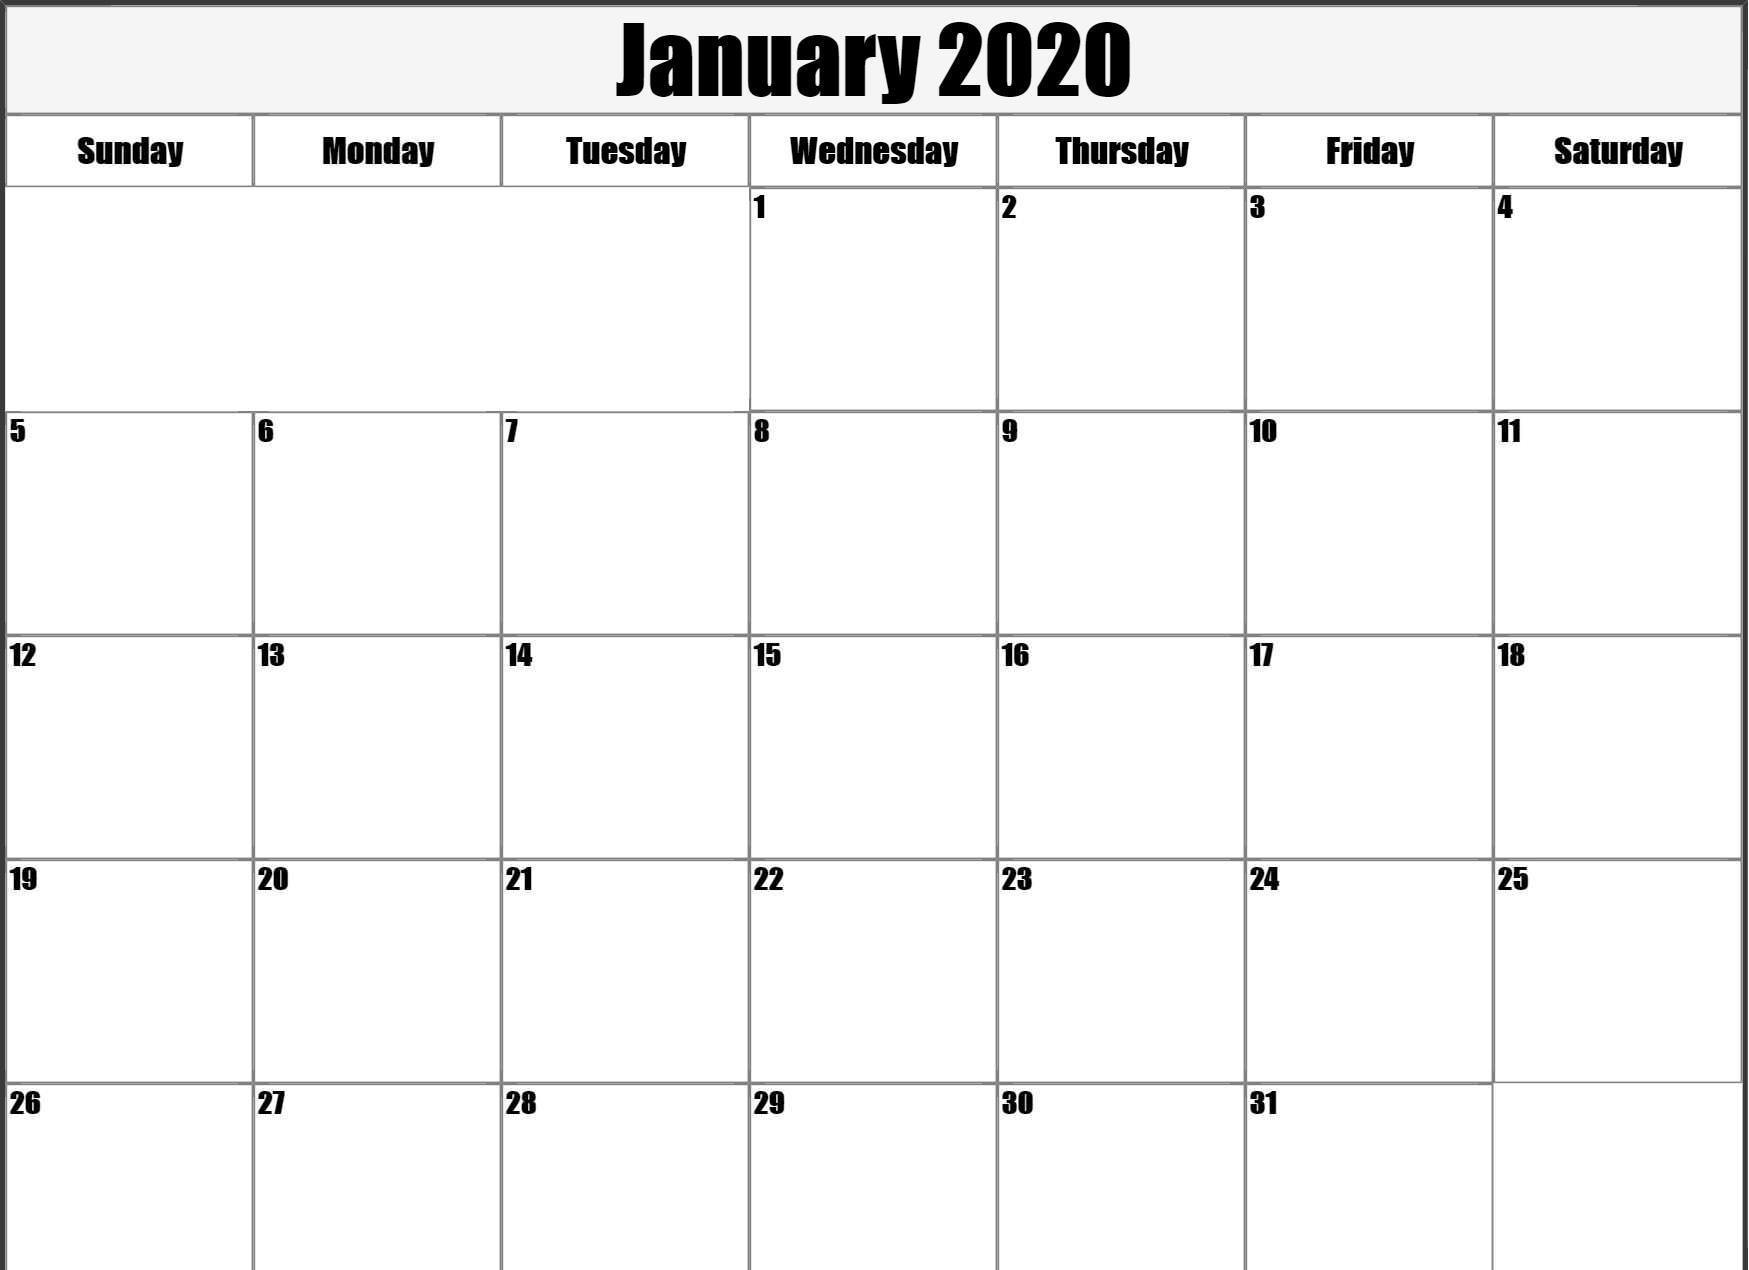 January 2020 Calendar Wallpapers - Wallpaper Cave